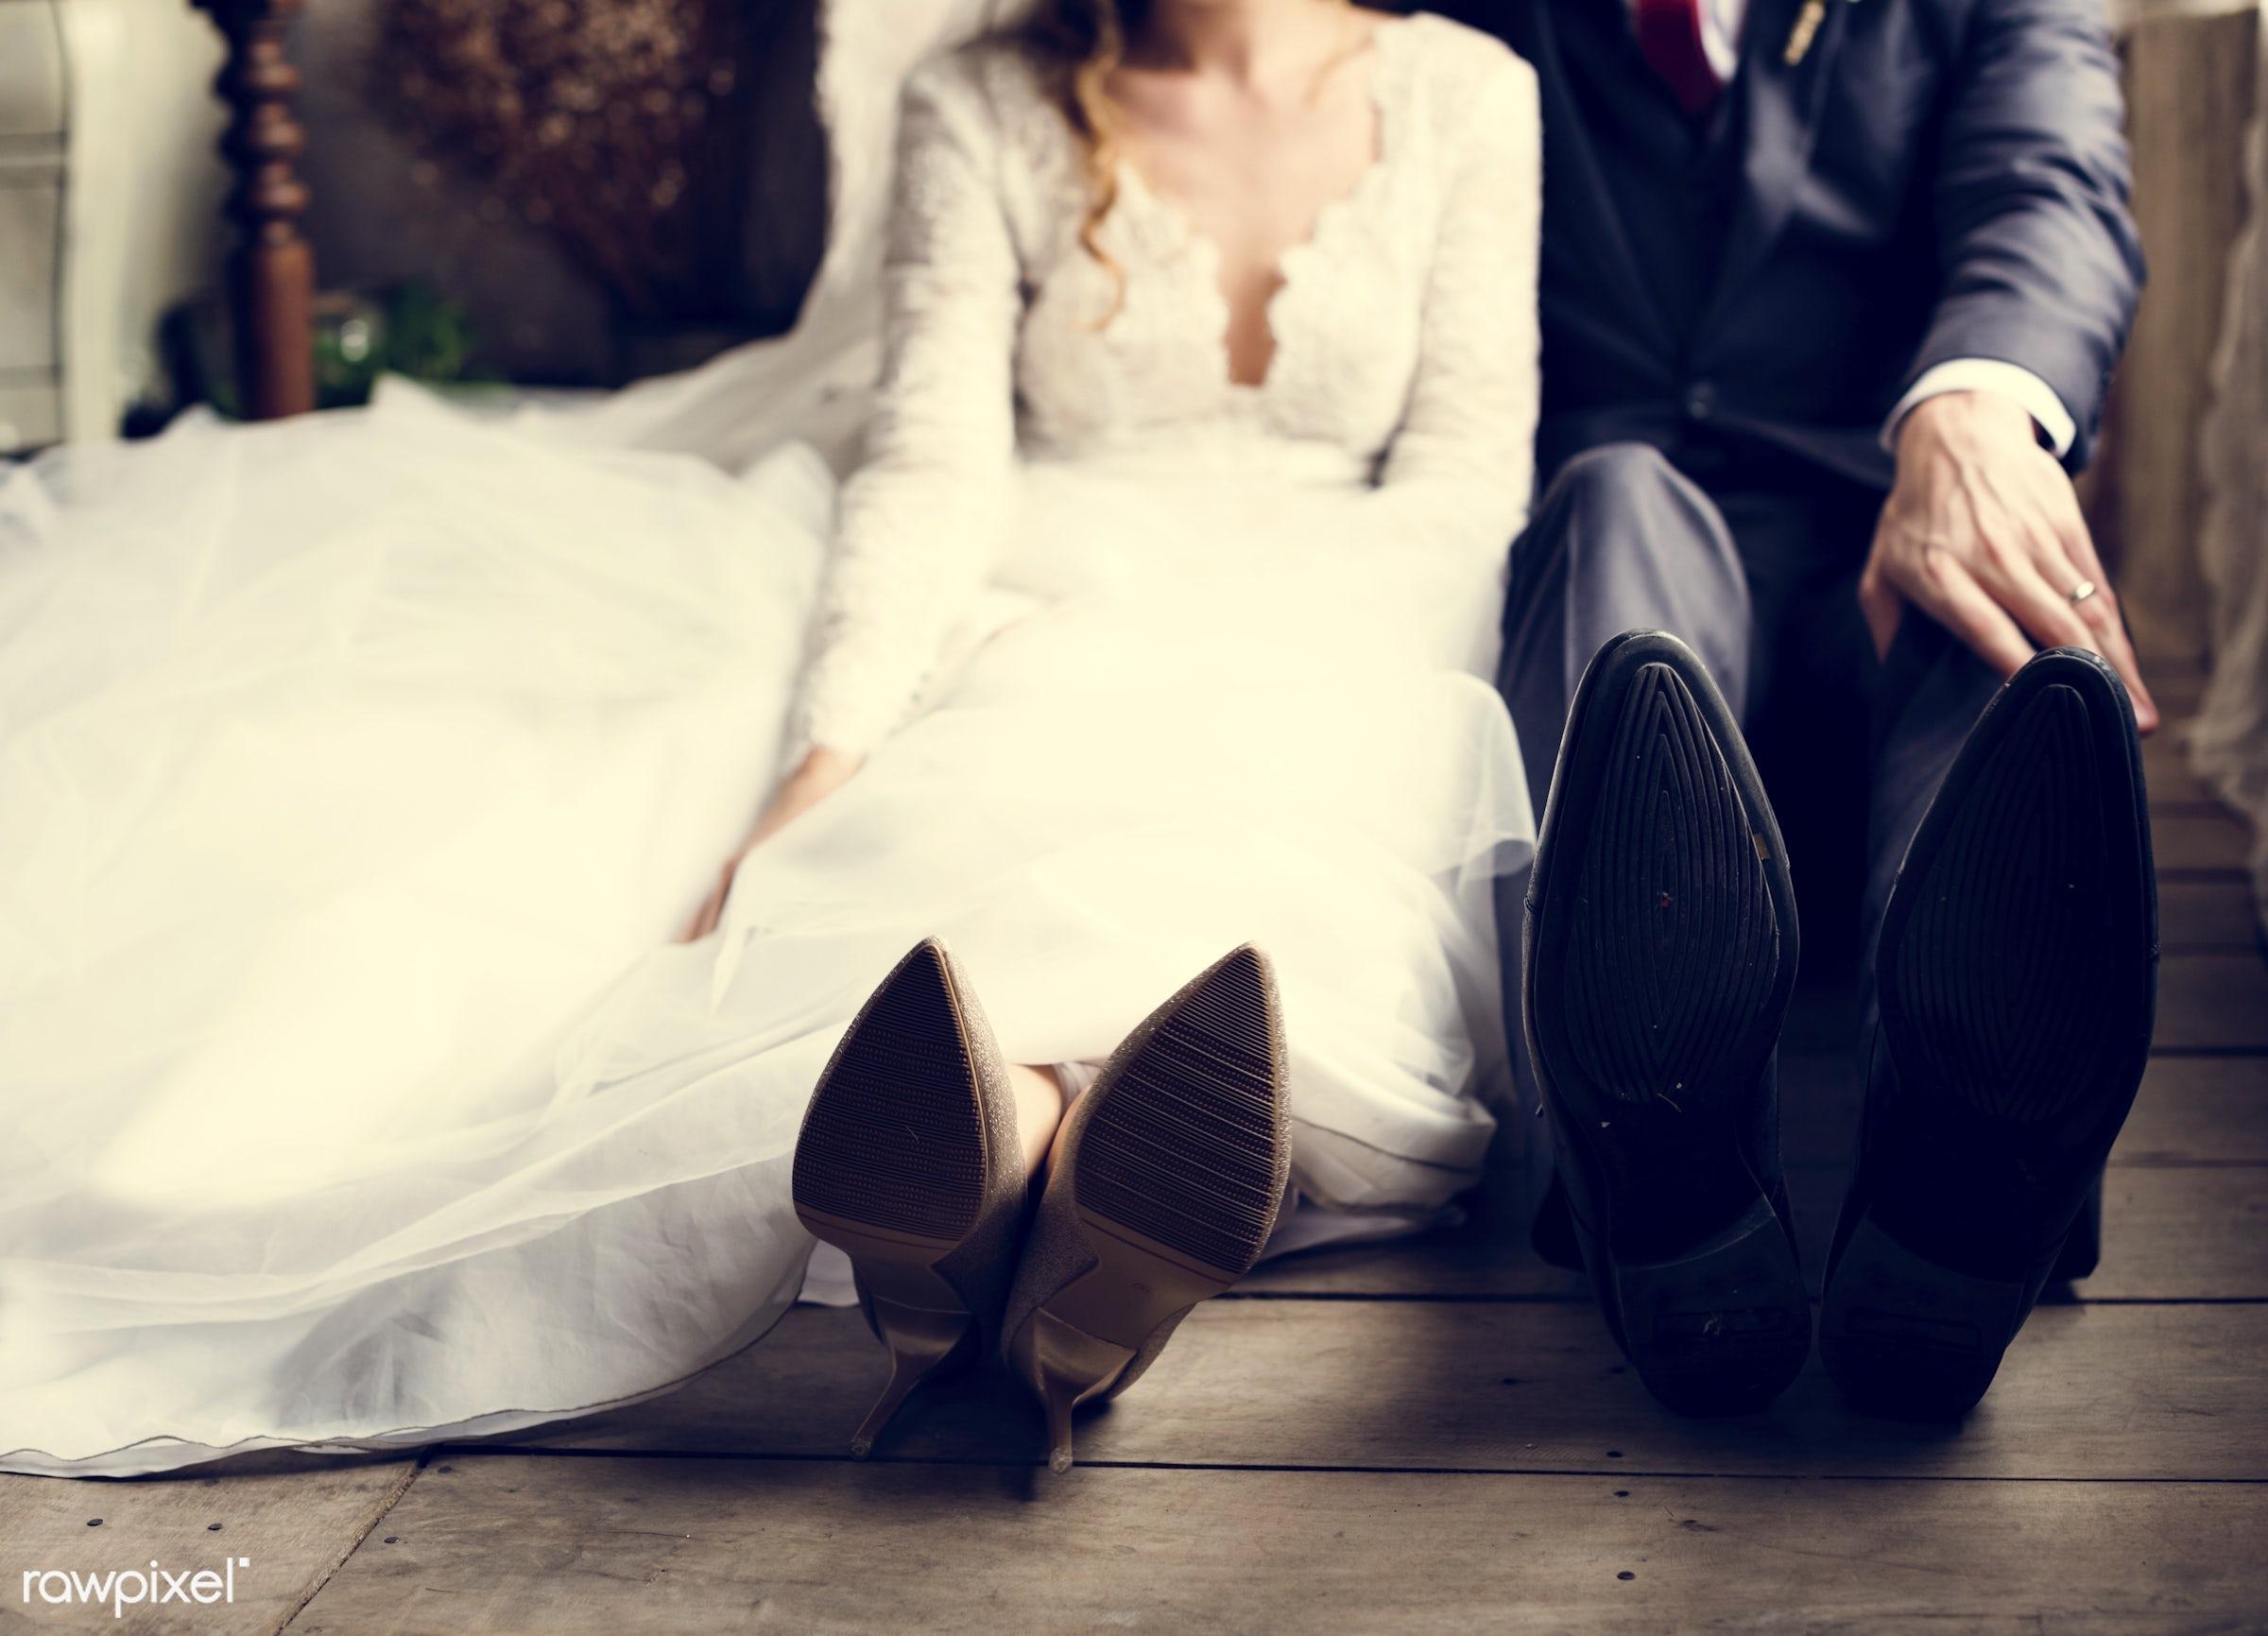 wedding, adult, attractive, beautiful, bouquet, bride, caucasian, celebration, ceremony, cheerful, dress, elegance, elegant...